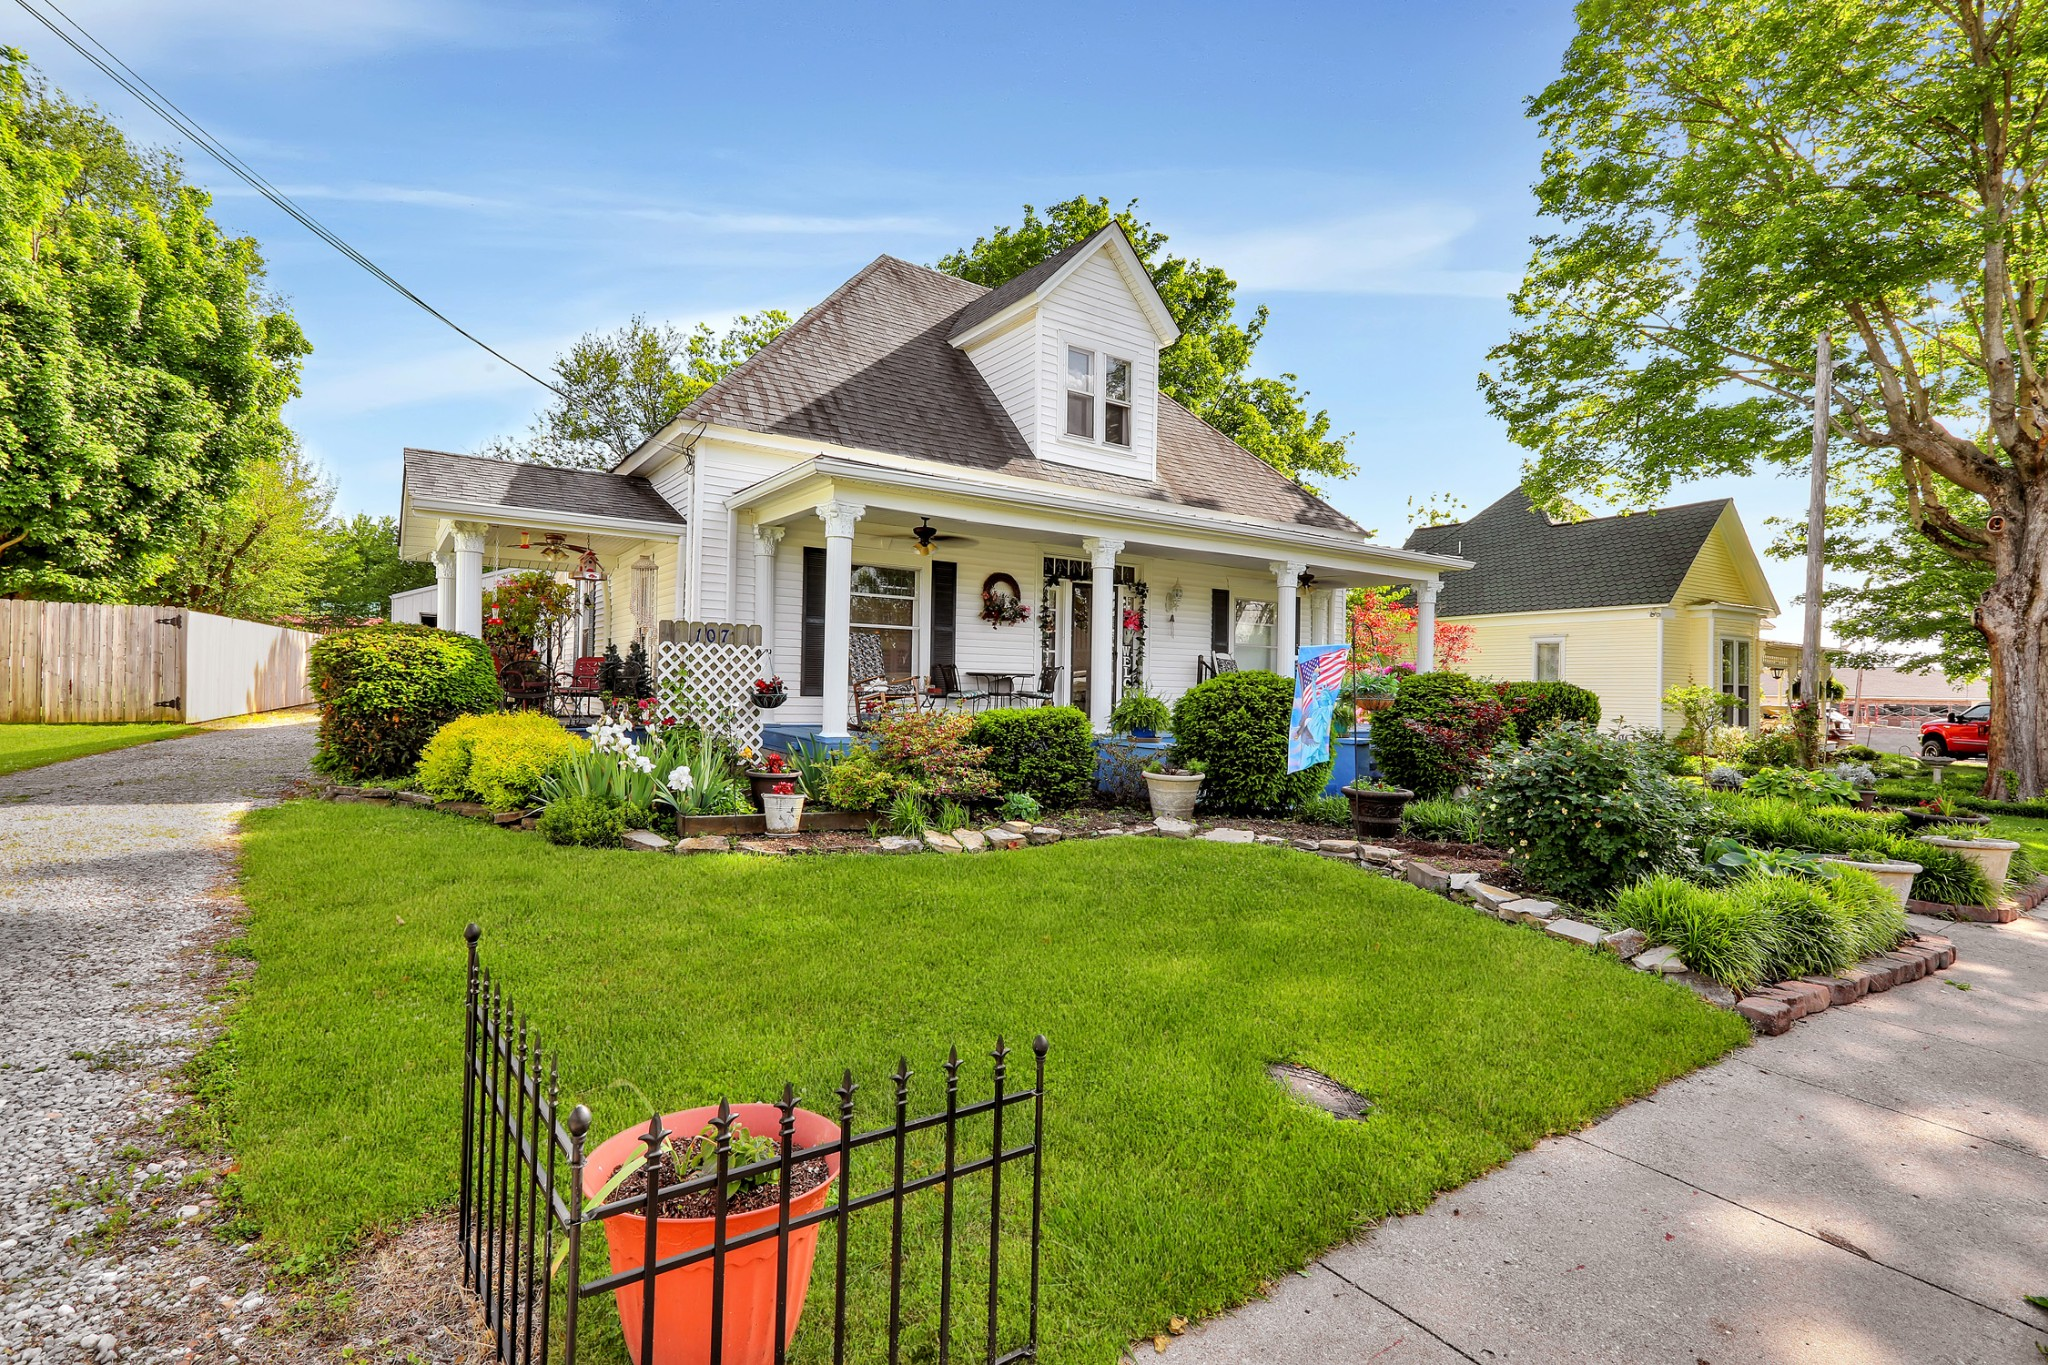 107 High St Property Photo - Portland, TN real estate listing